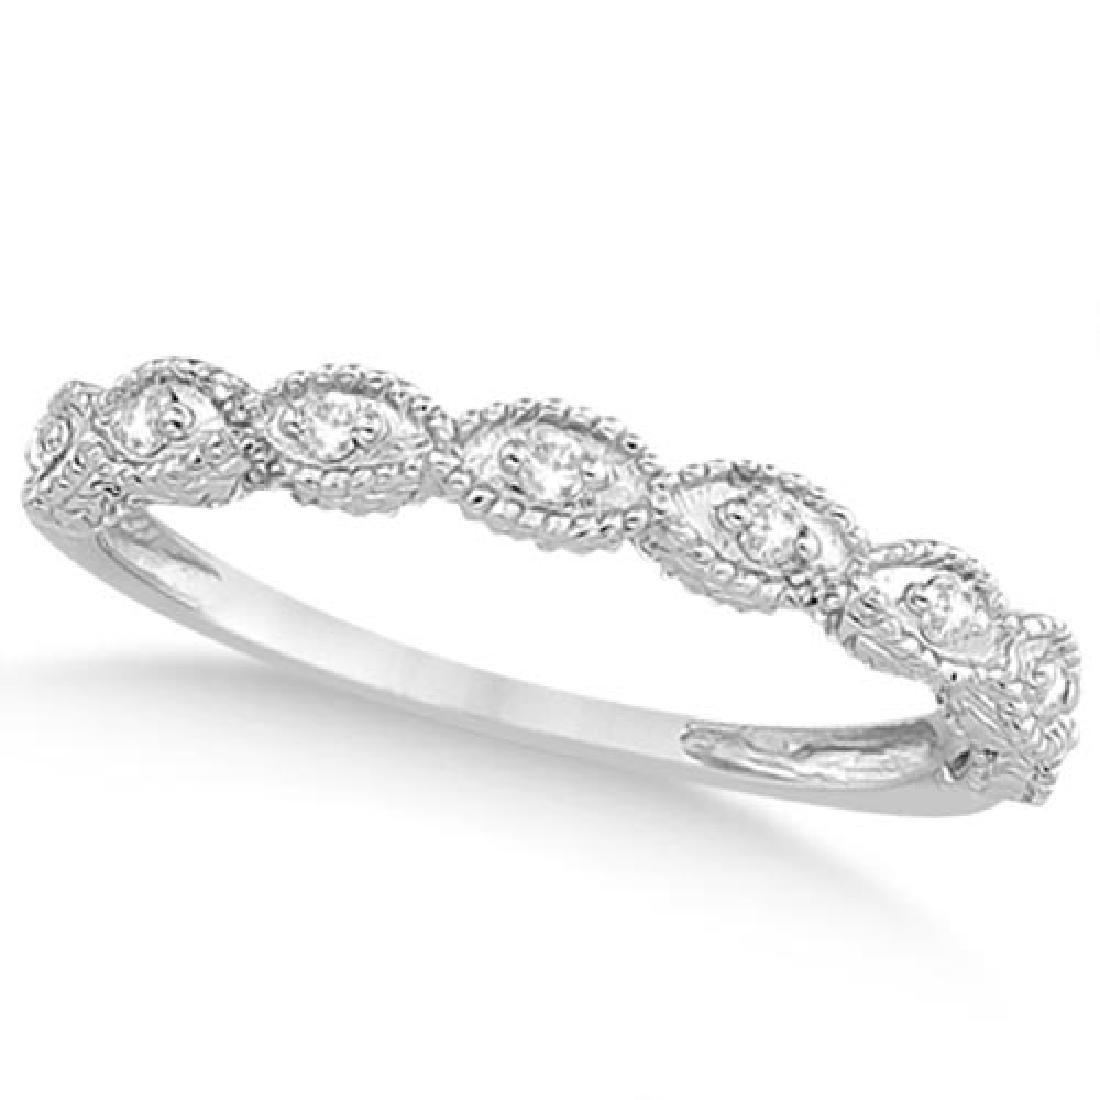 Antique Marquise Shape Diamond Wedding Ring 14k White G